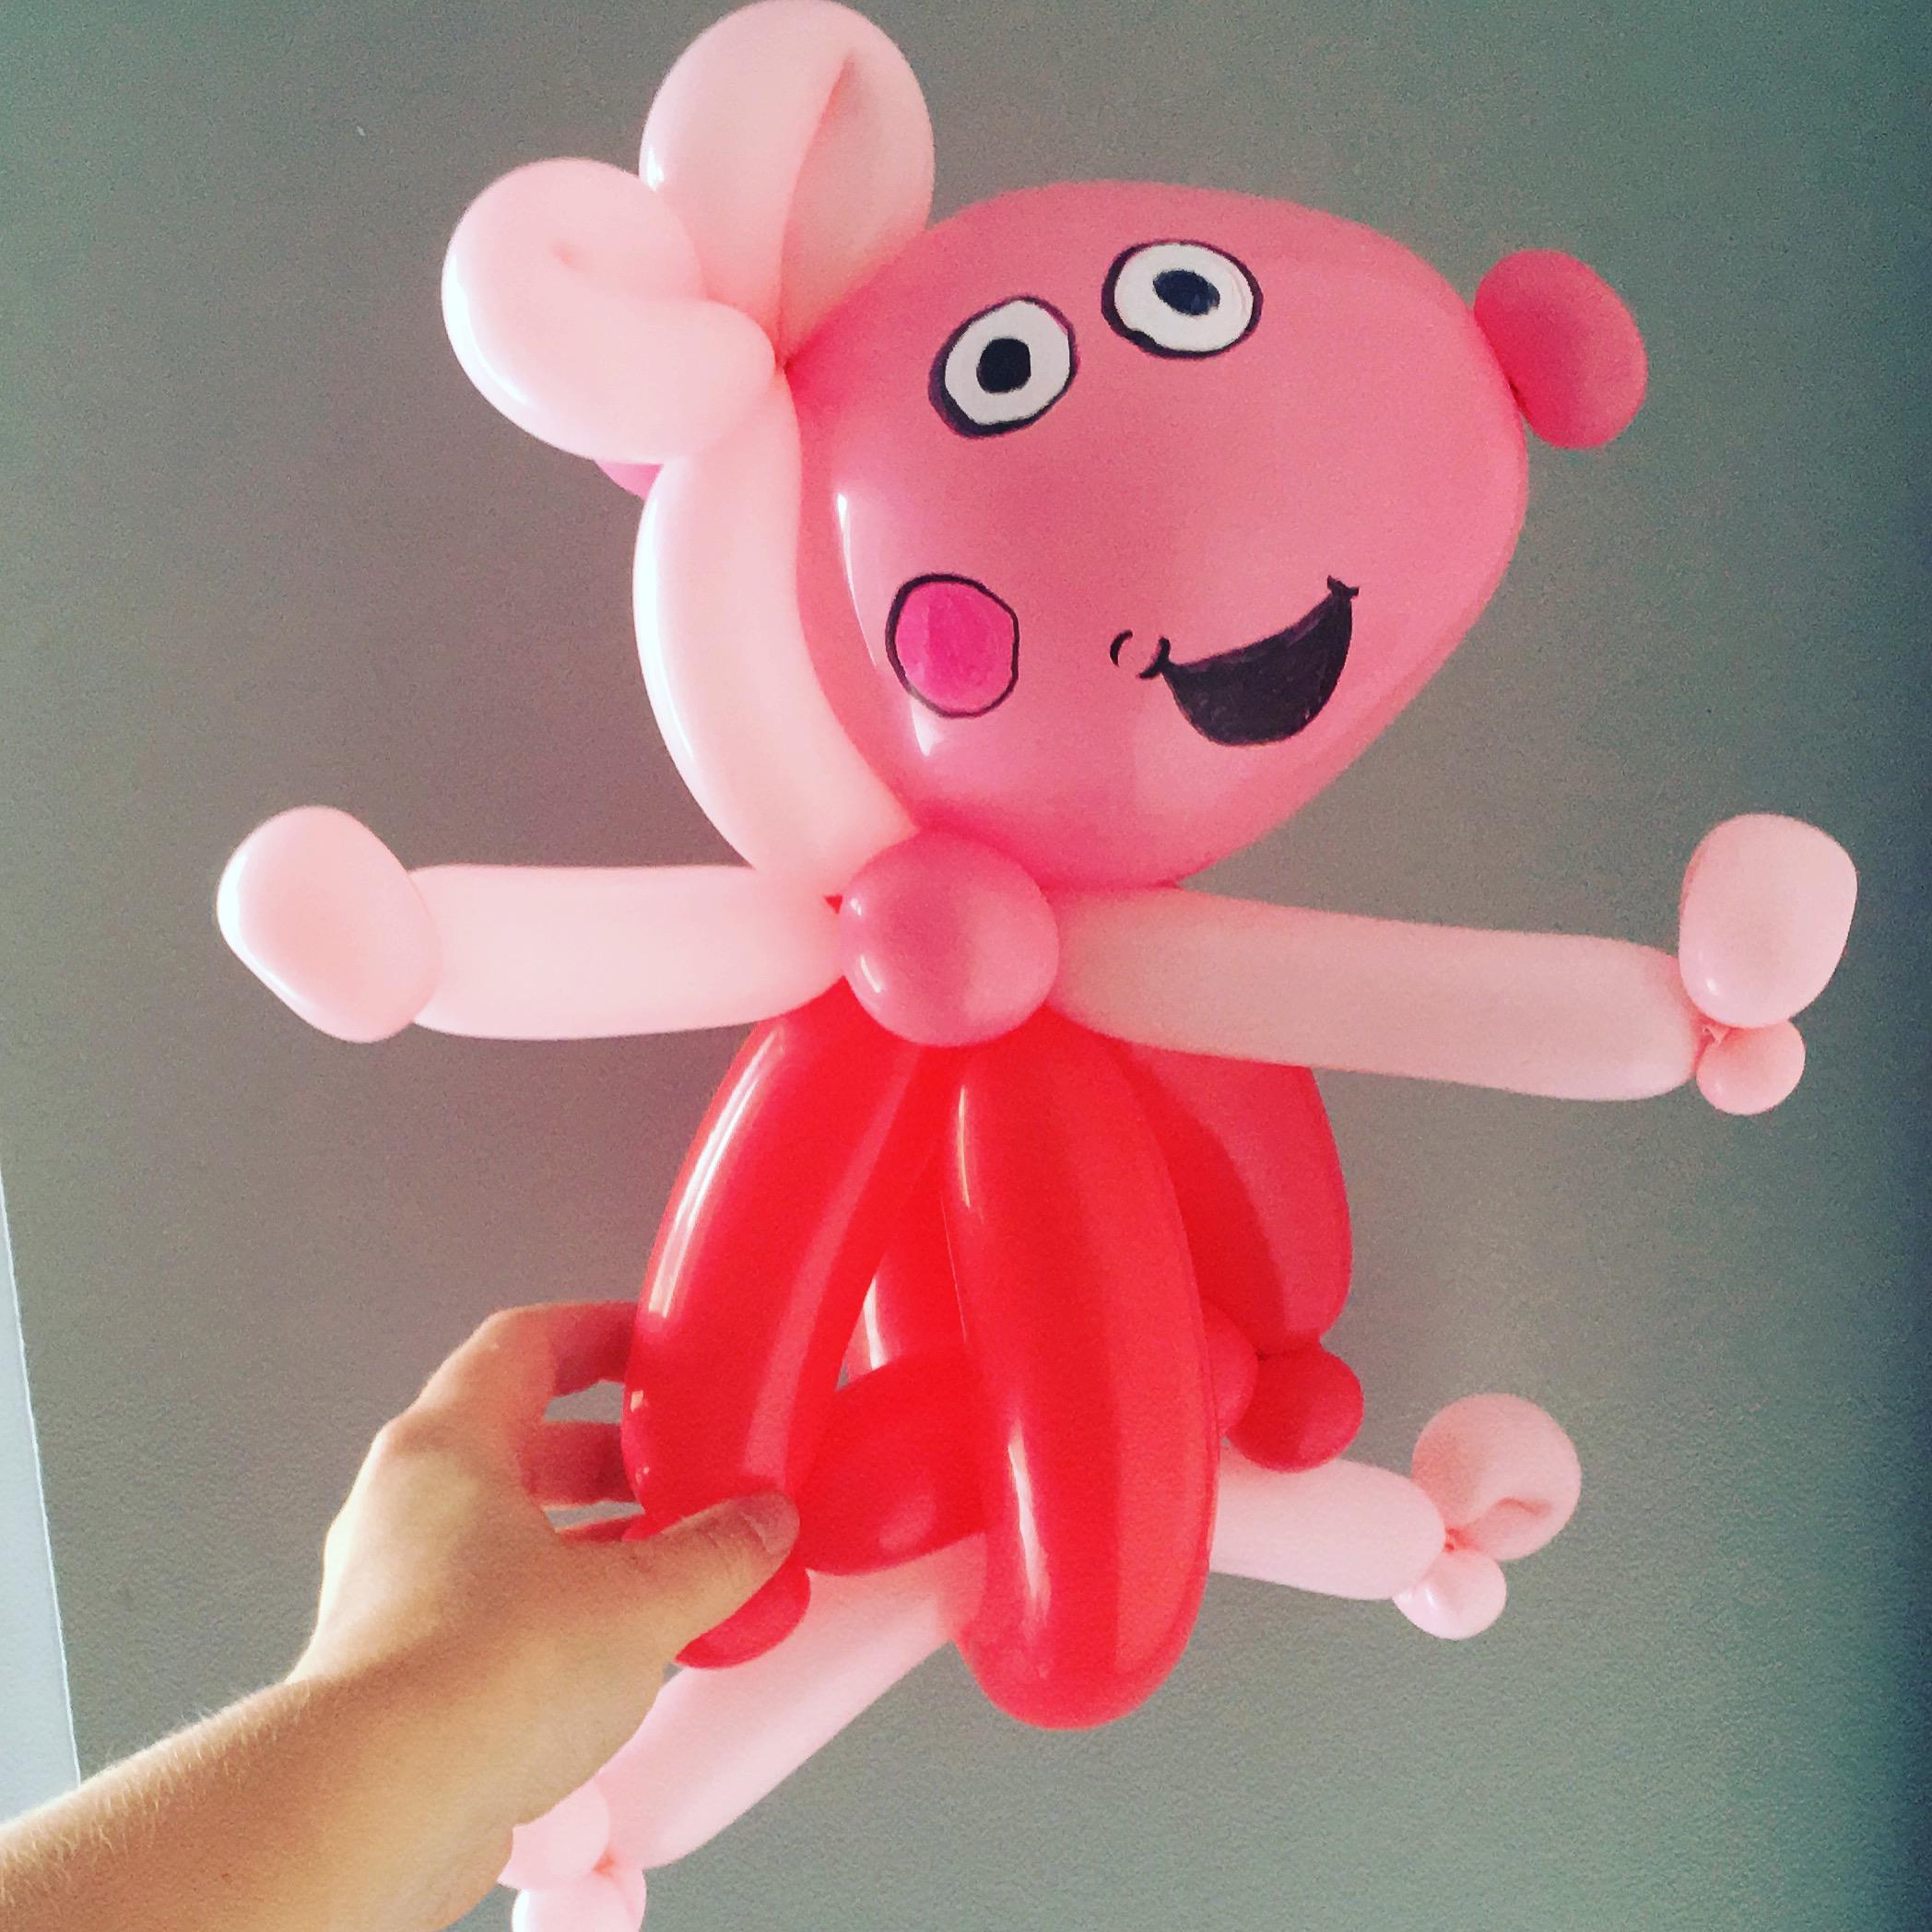 Peppa Pig balloon model